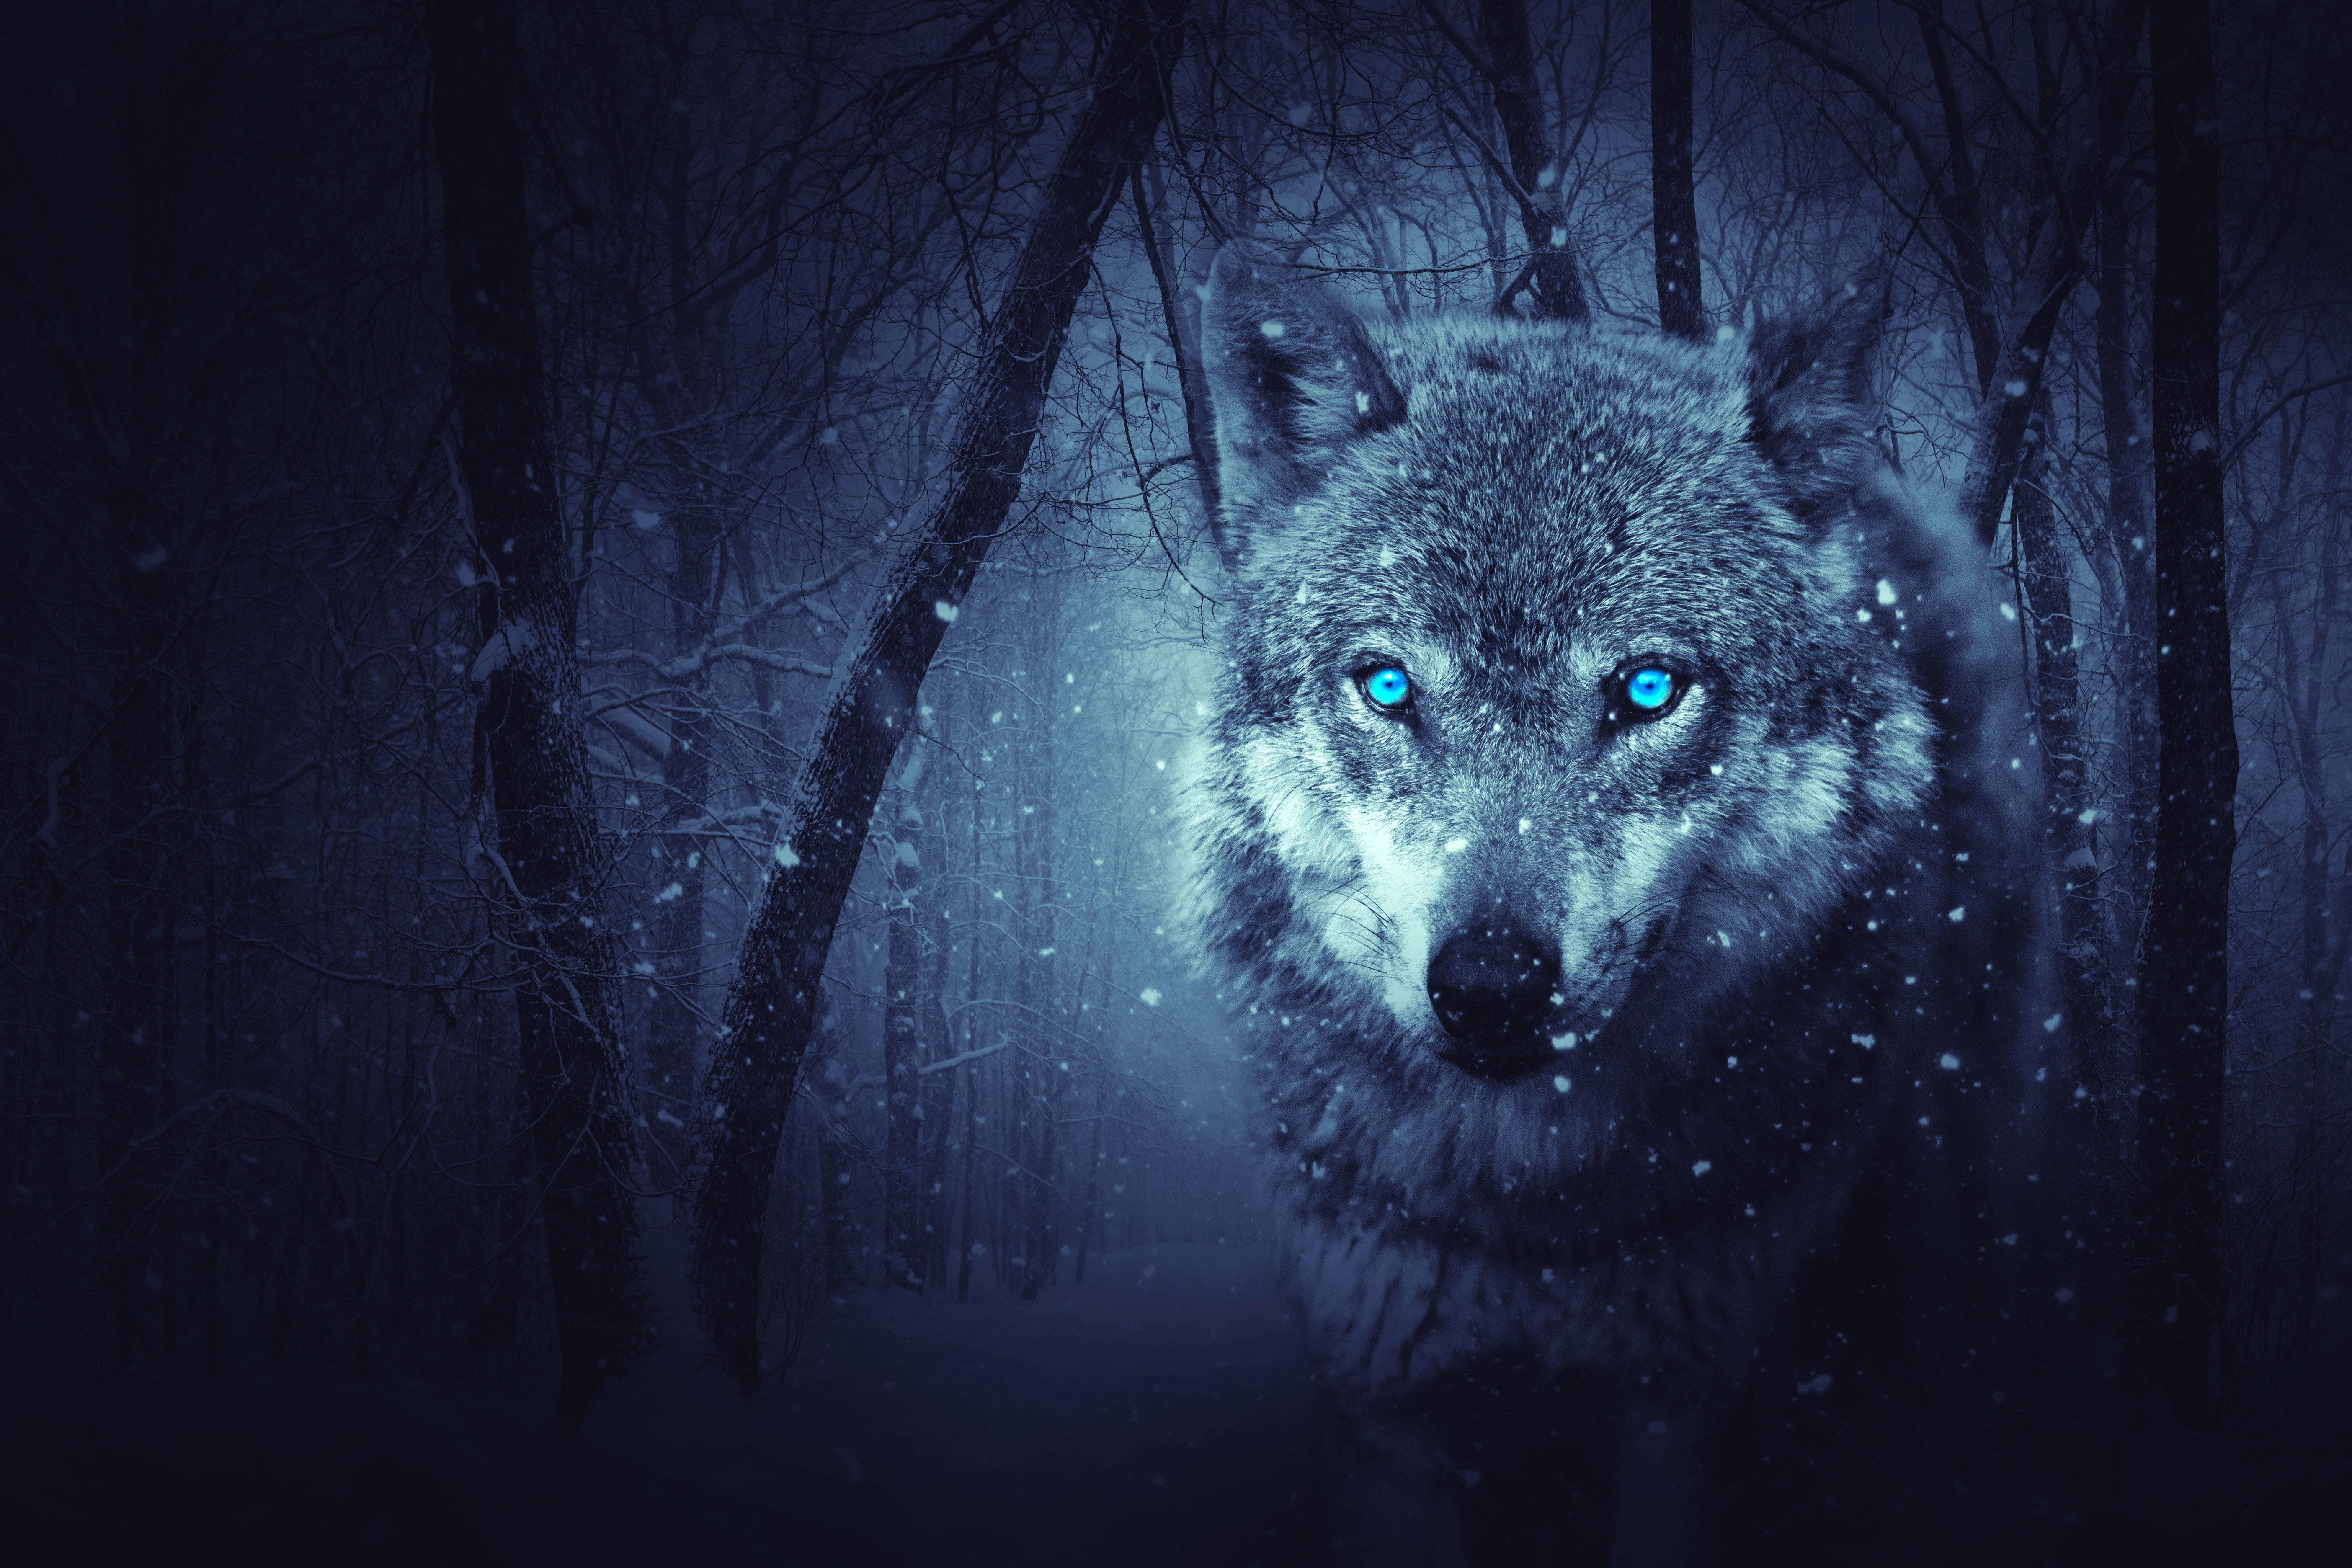 Fantasy Wolf Wallpaper 12   5616 X 3744 stmednet 5616x3744